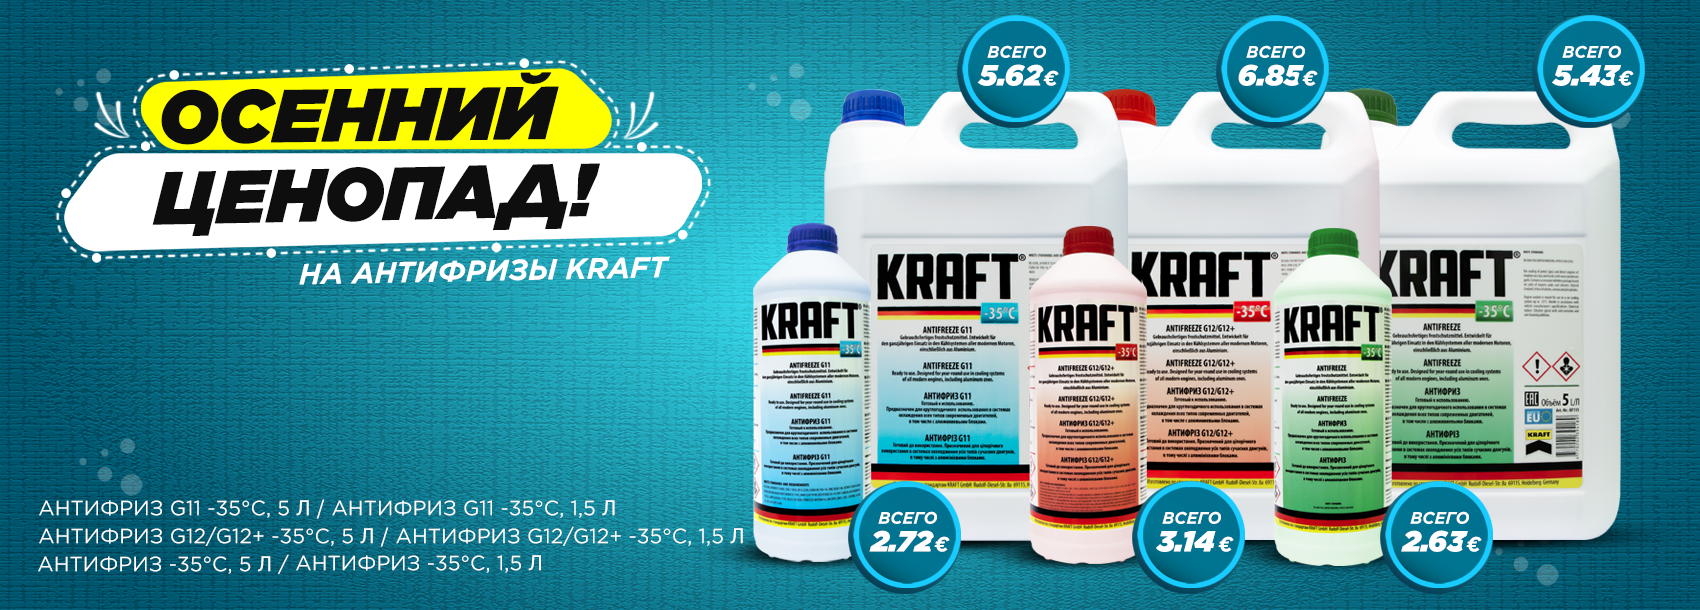 Осенний ценопад: скидка 30% при заказе от 3 шт антифризов KRAFT.